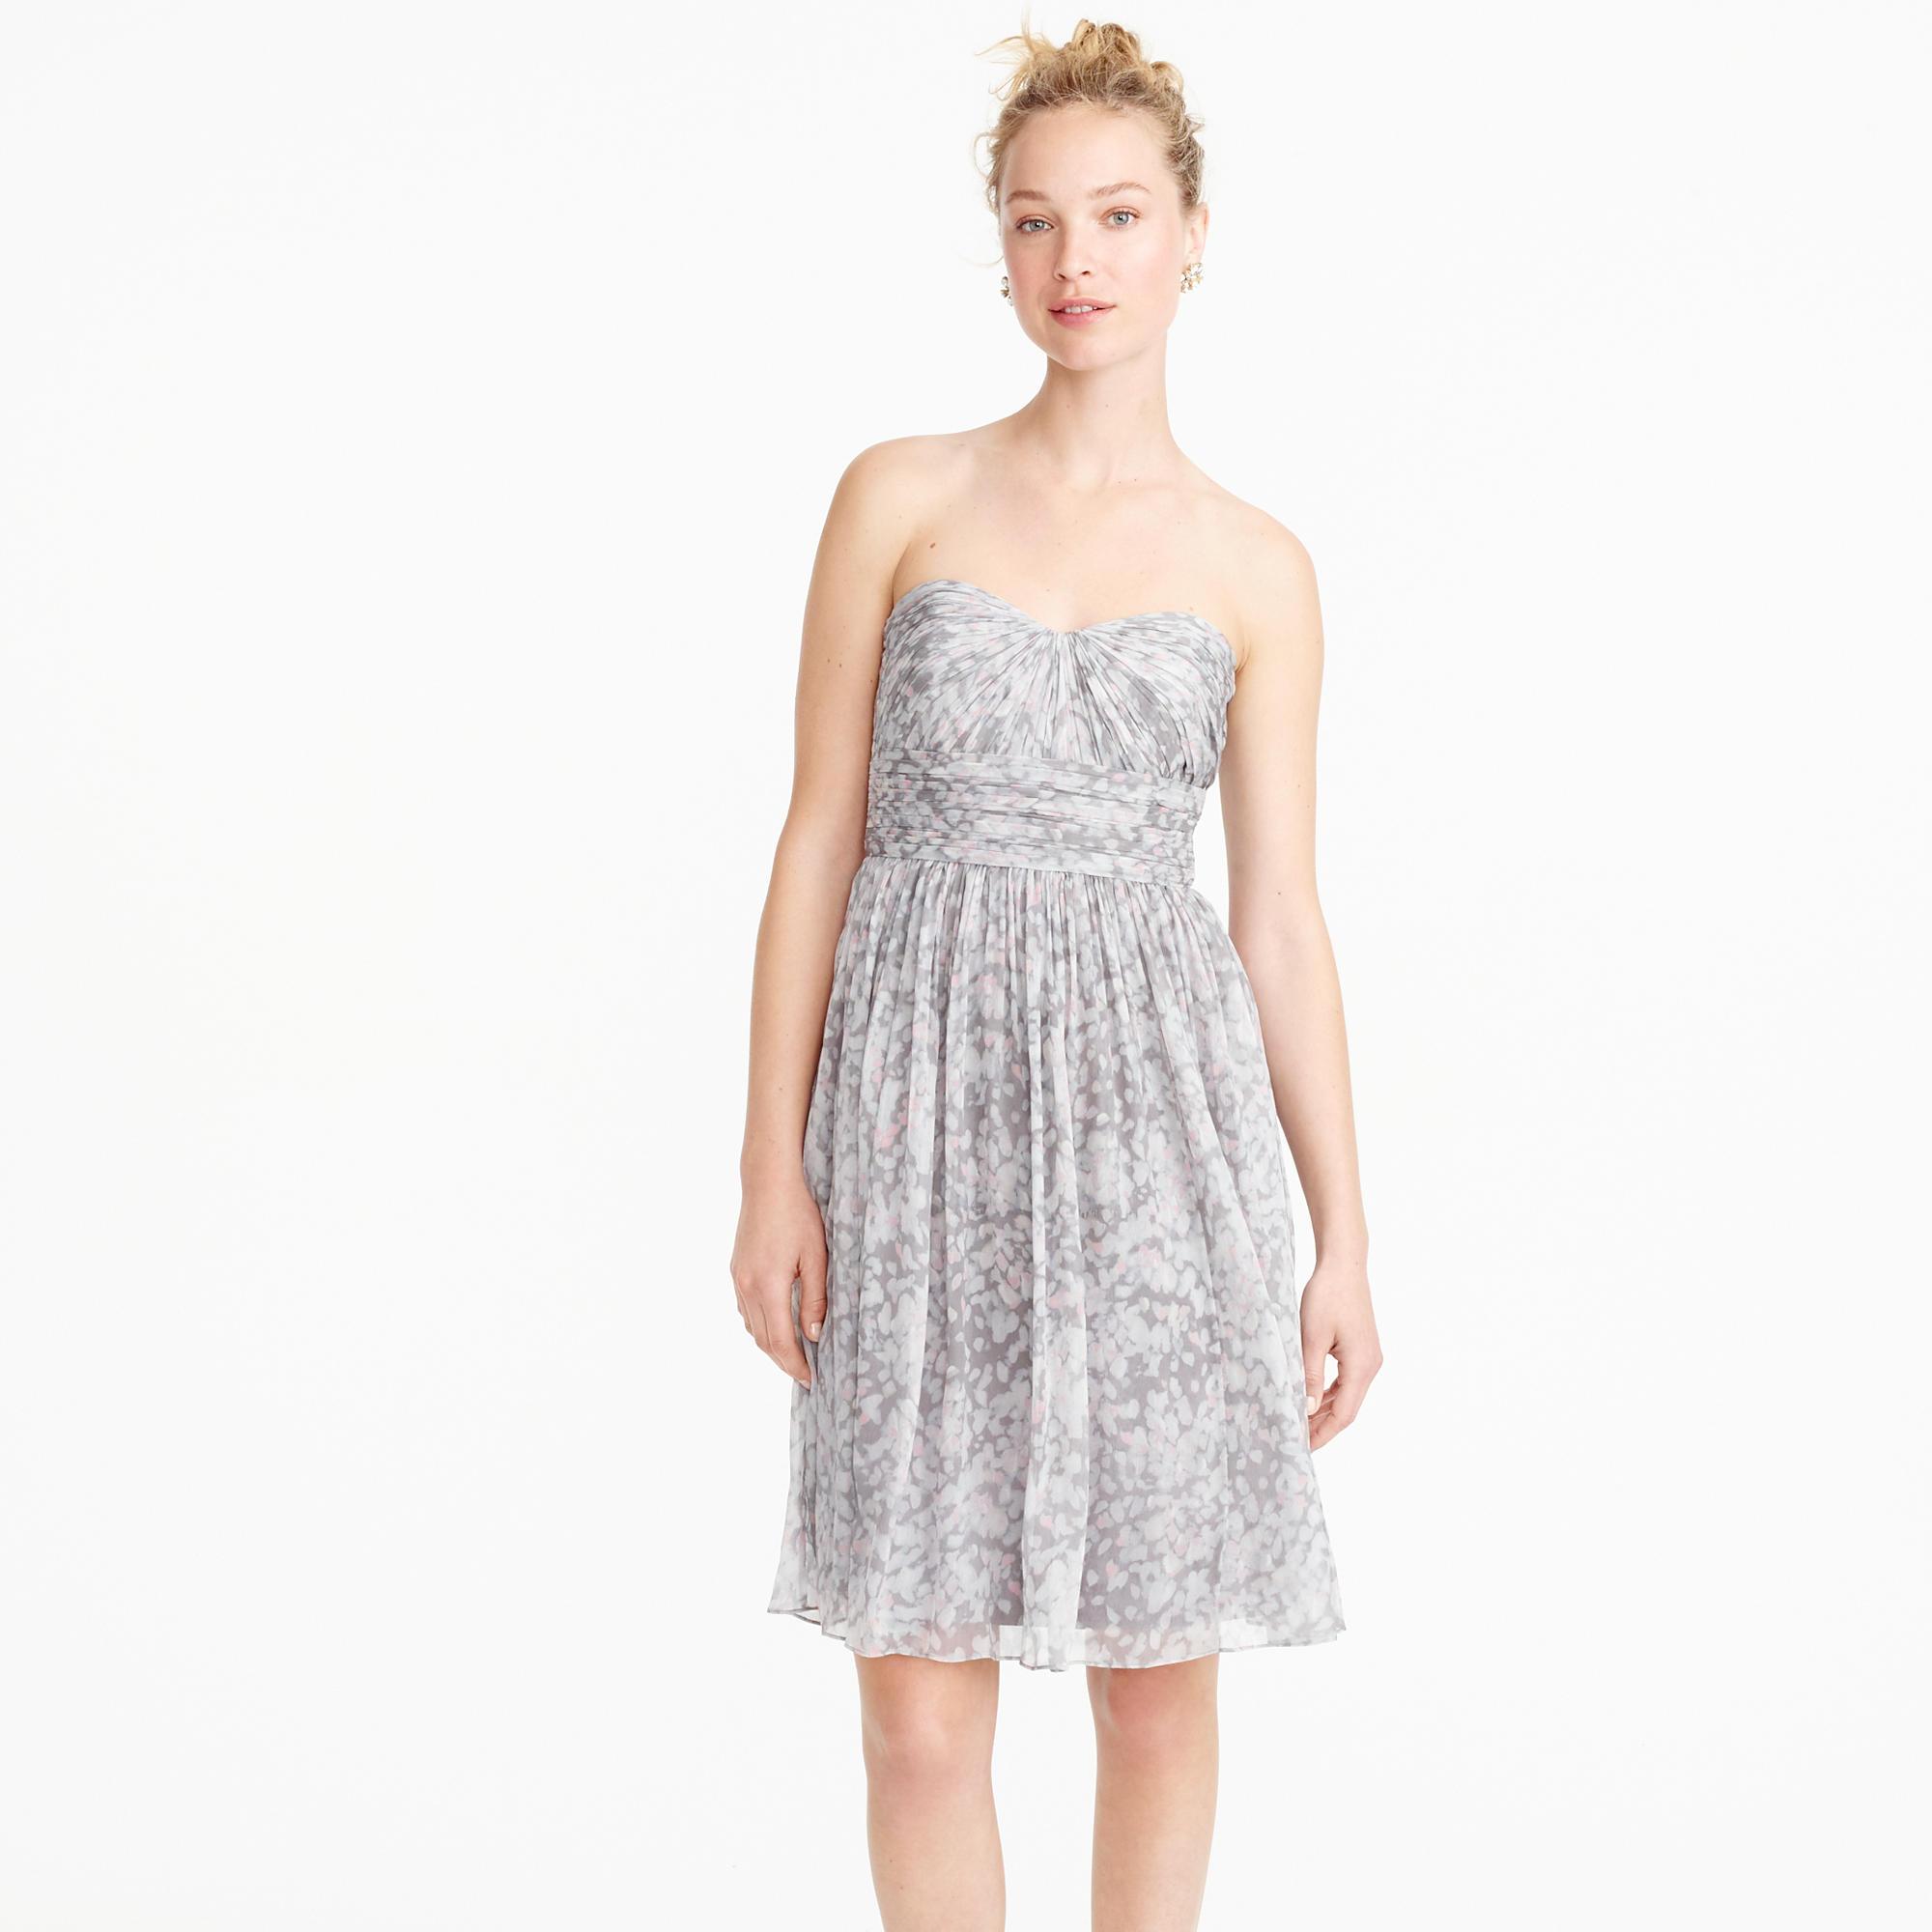 October 2014 dressyp part 3 marbella strapless dress in watercolor silk chiffon wedding ombrellifo Choice Image